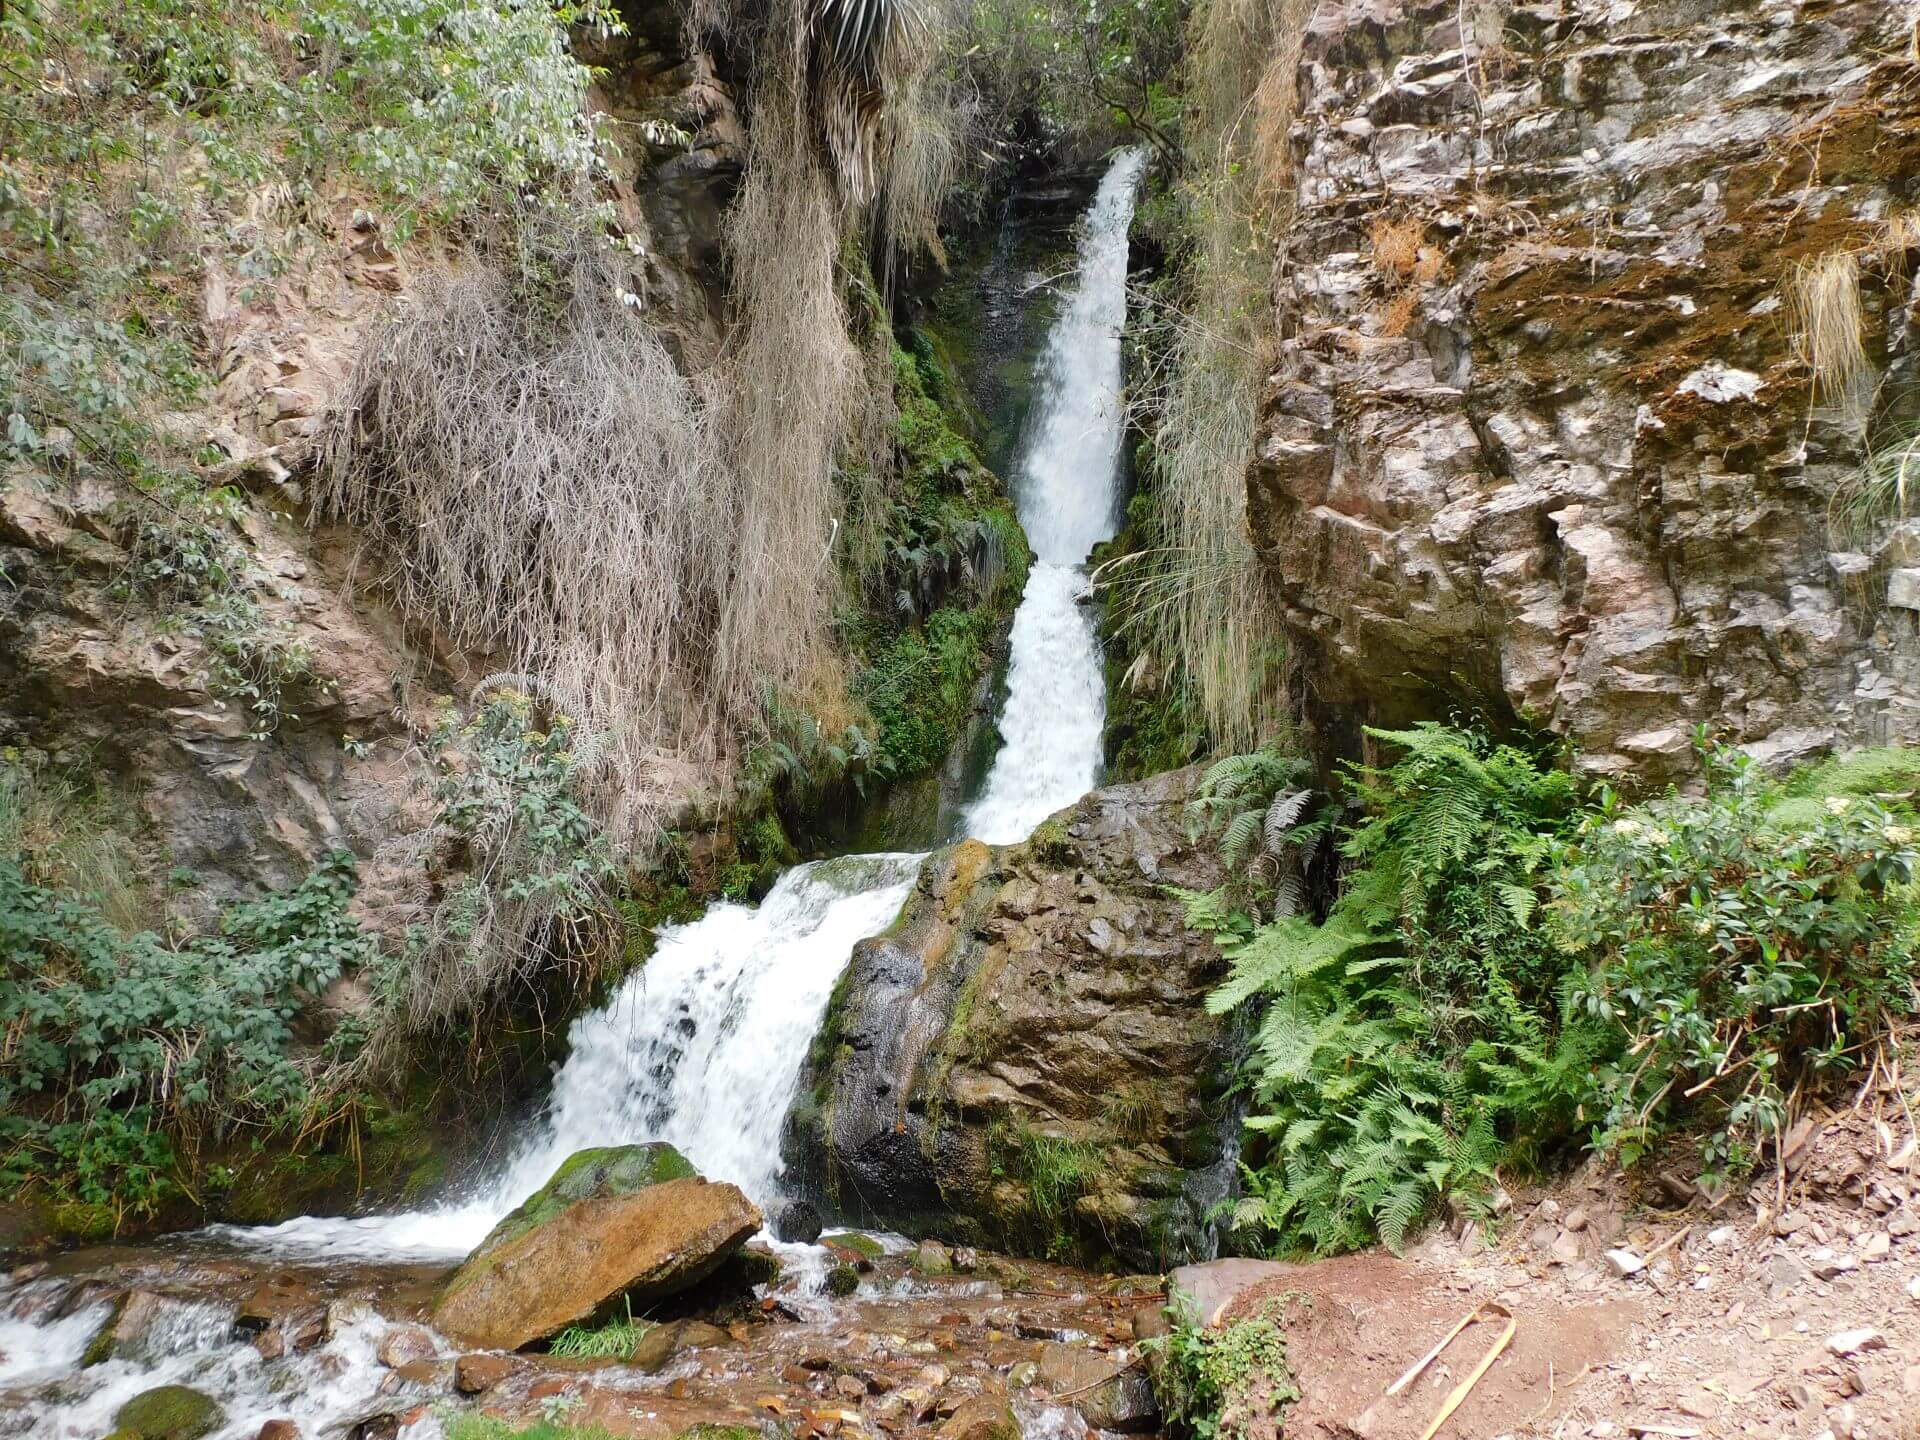 Hike To The PocPoc Waterfall